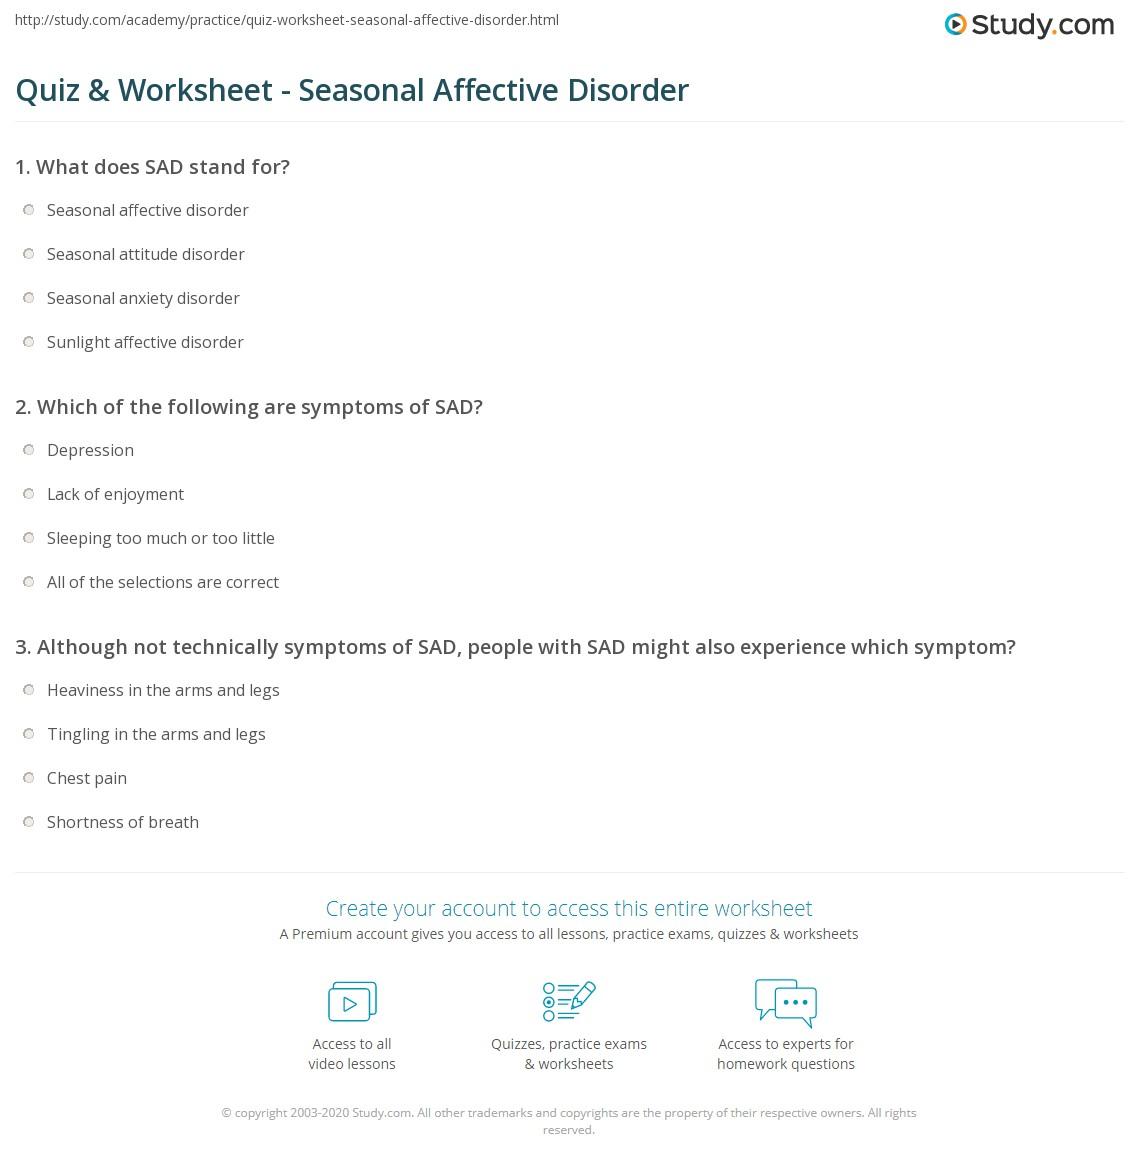 quiz & worksheet - seasonal affective disorder | study